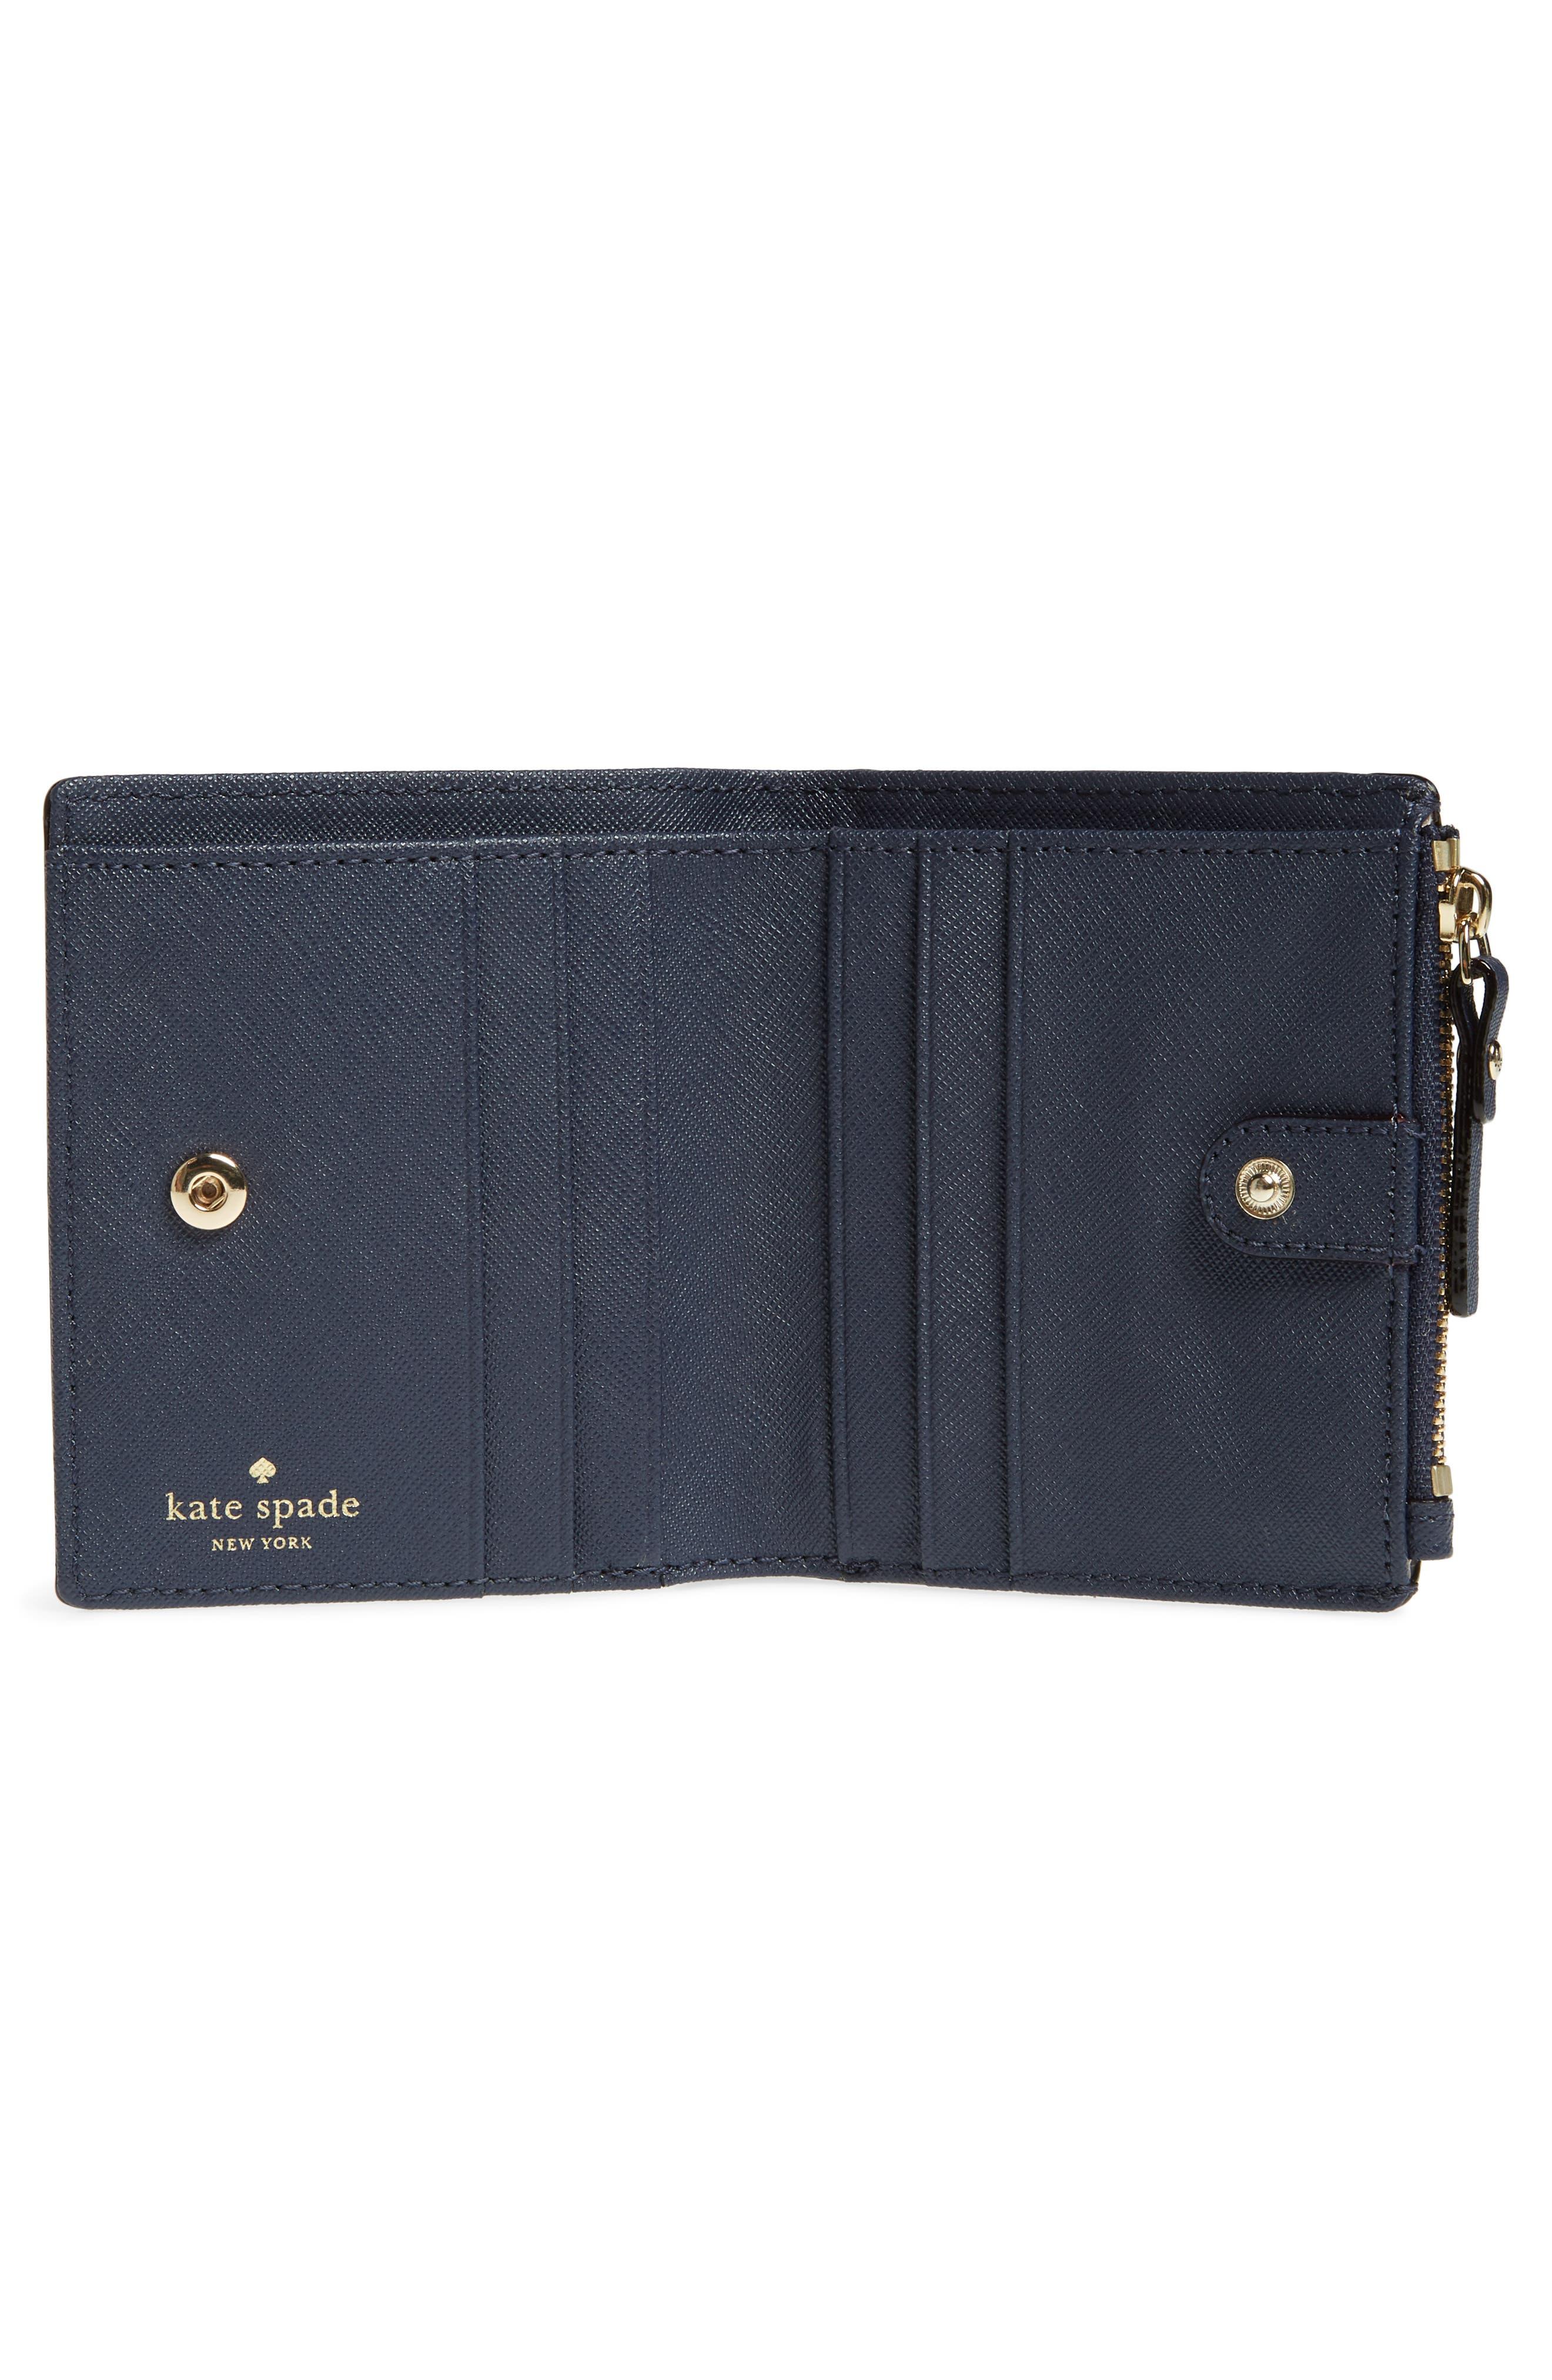 shore thing - stripe adalyn leather wallet,                             Alternate thumbnail 2, color,                             Multi